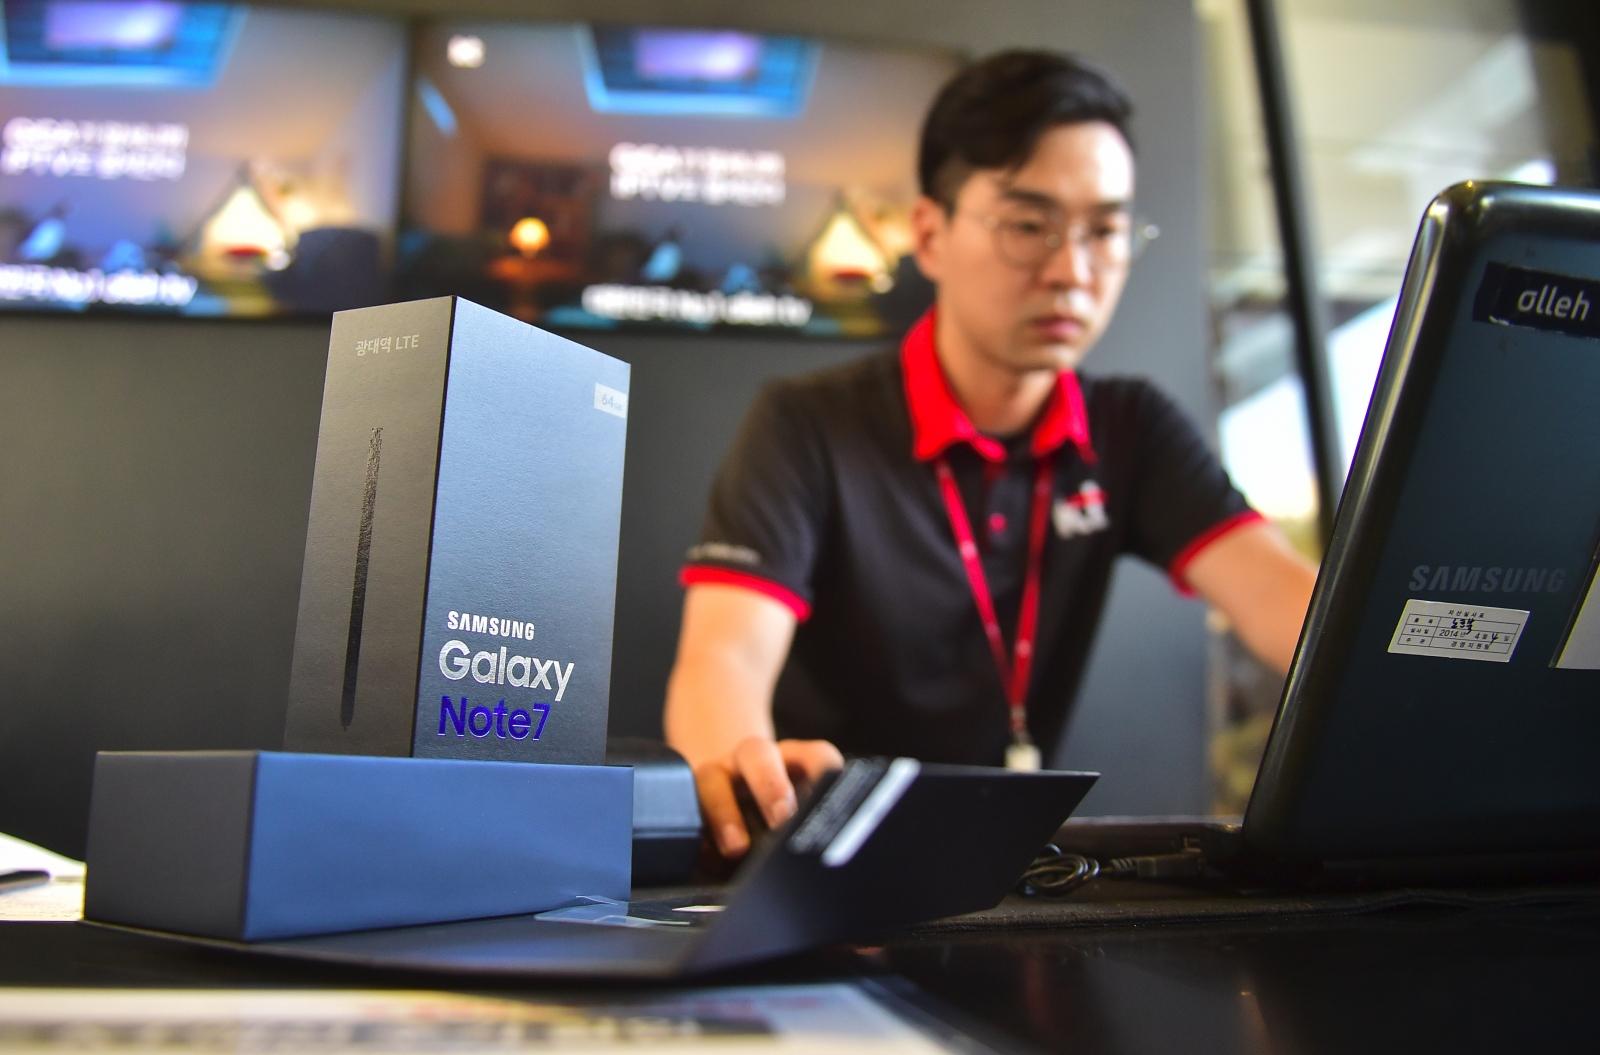 Galaxy Note 7 UK Exchange Programme